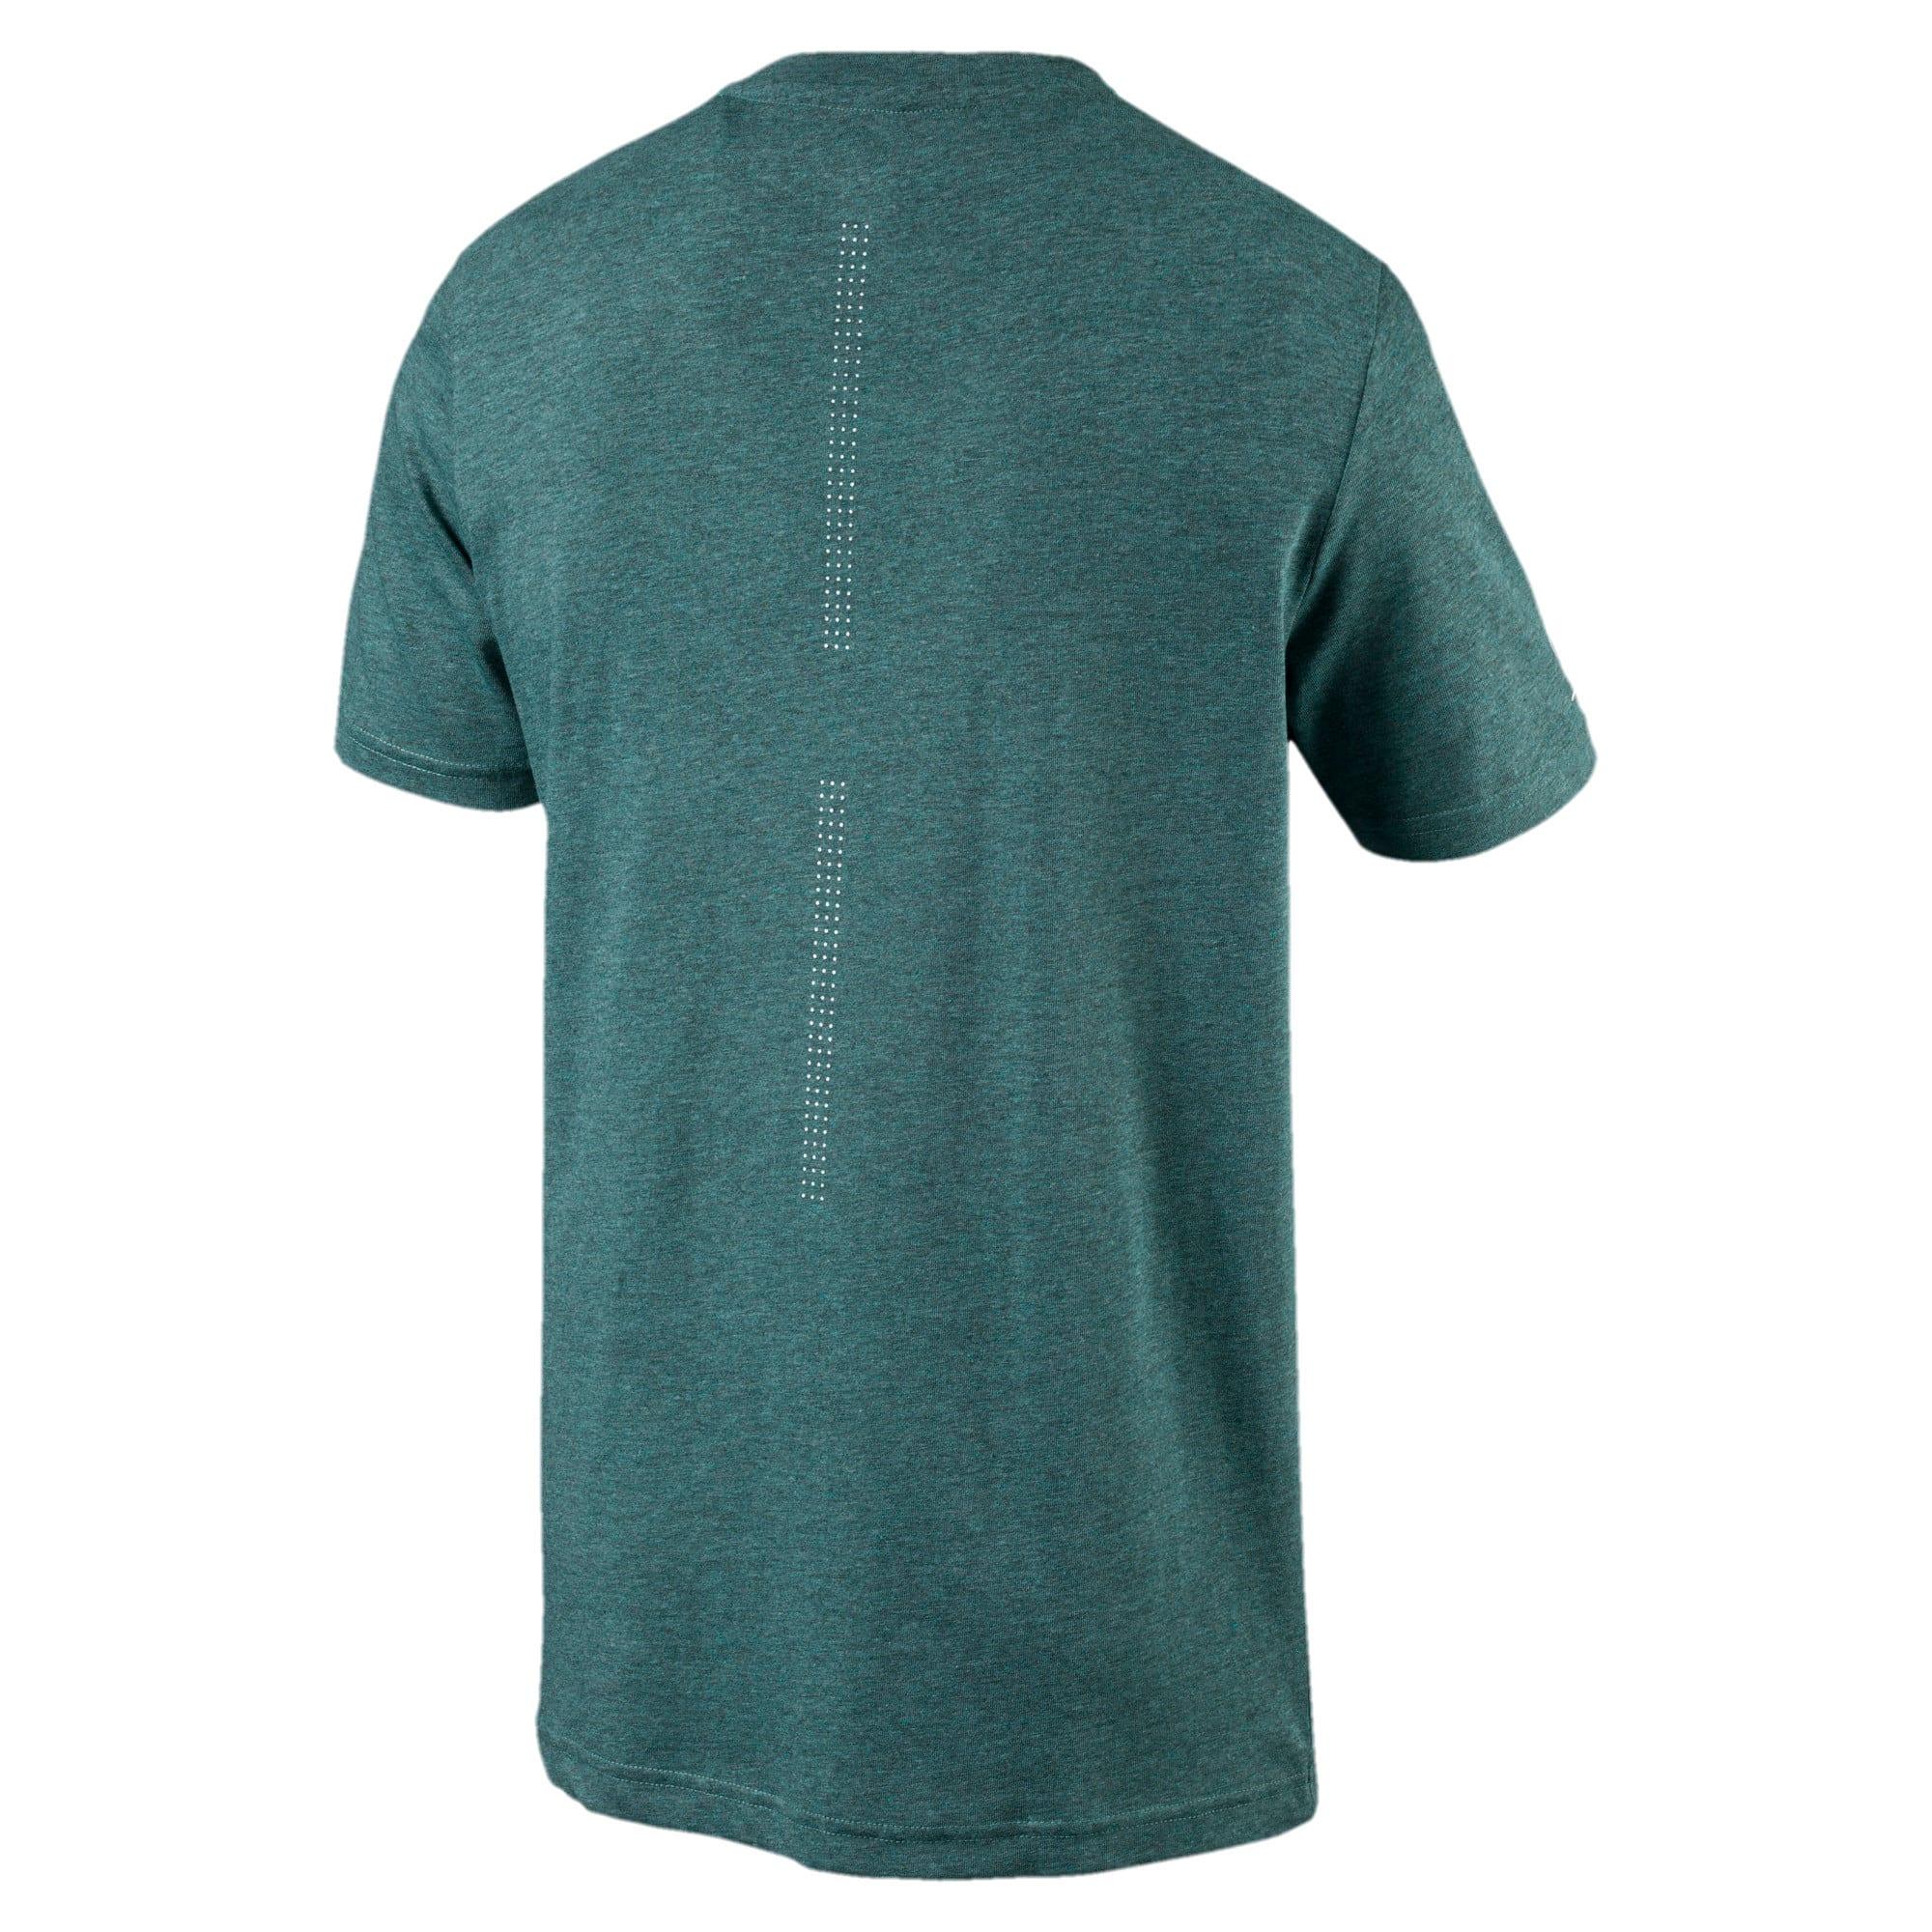 Thumbnail 3 of MERCEDES AMG PETRONAS Men's Driver T-Shirt, Deep Teal Heather, medium-IND